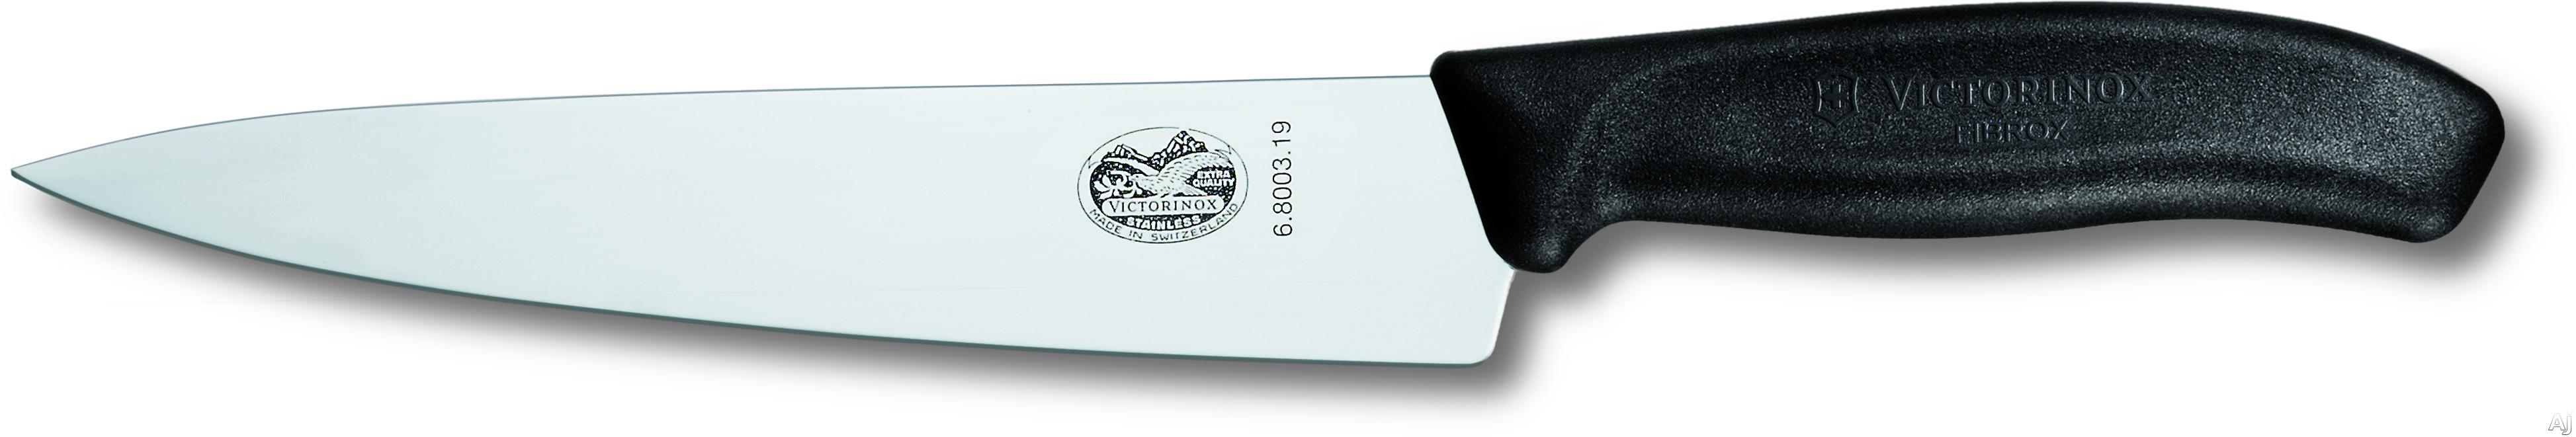 Victorinox 6800319US1 Swiss Classic 8